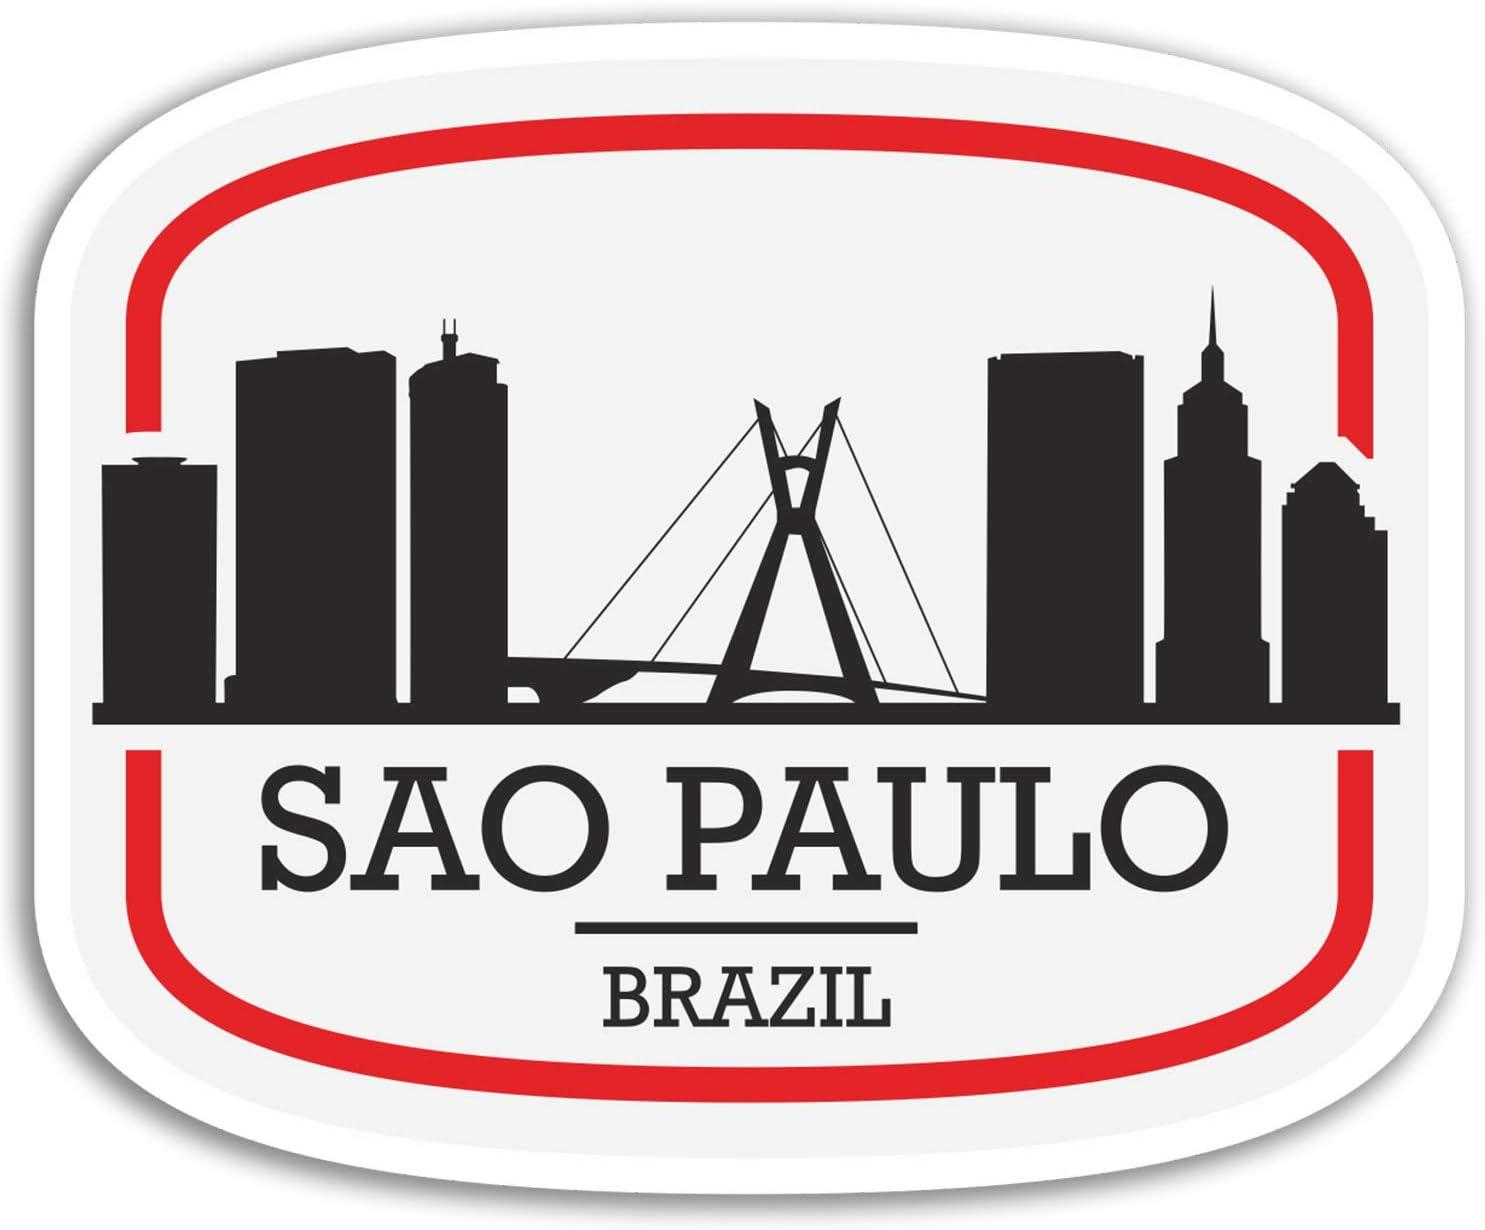 2 x 10cm Sao Paulo Brazil Vinyl Stickers - Travel Sticker Laptop Luggage #17089 (10cm Wide)